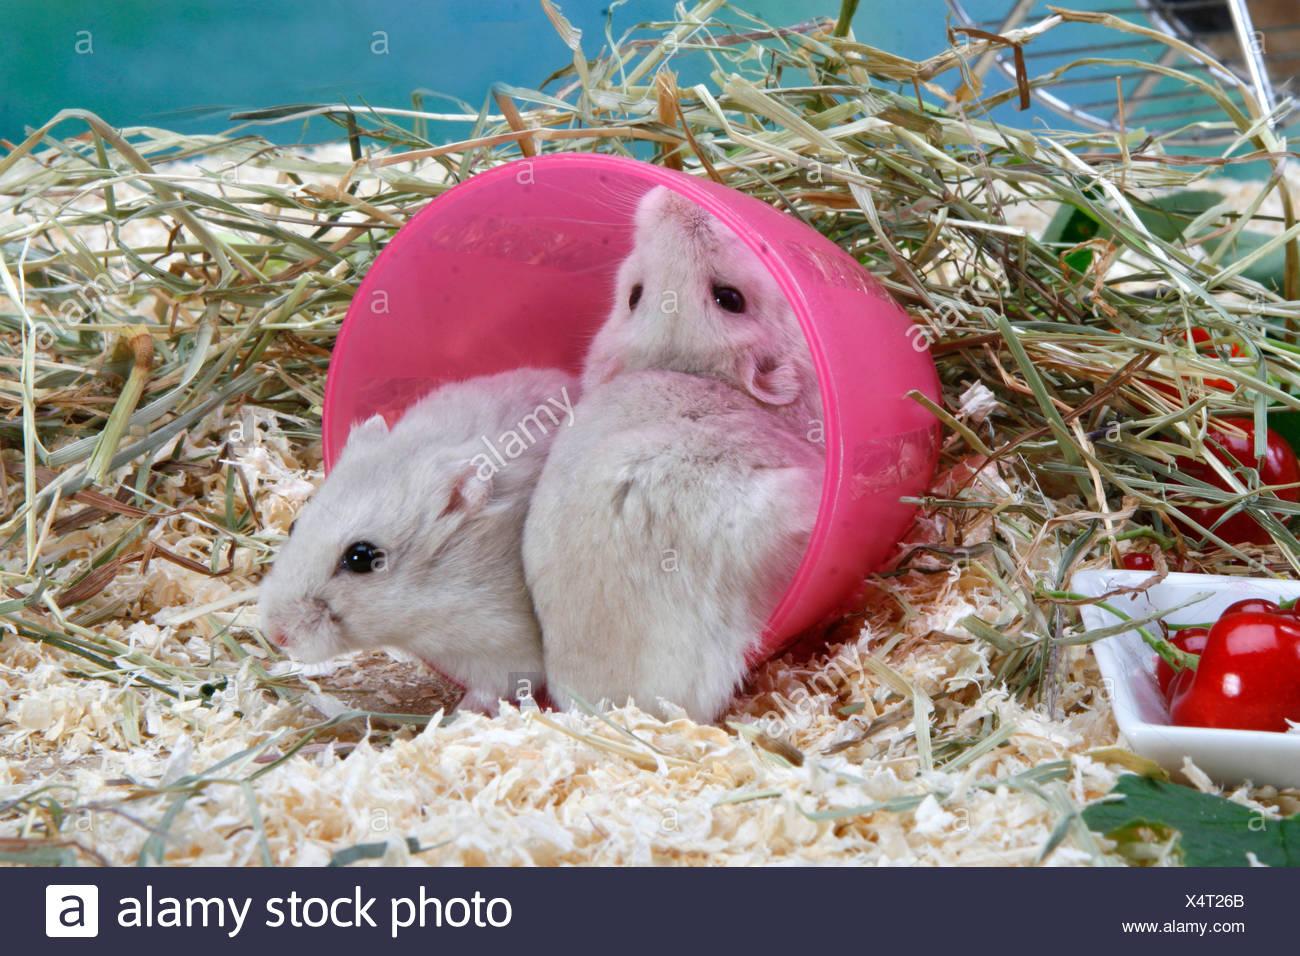 Roborovski Hamster Stock Photo: 278353107 - Alamy